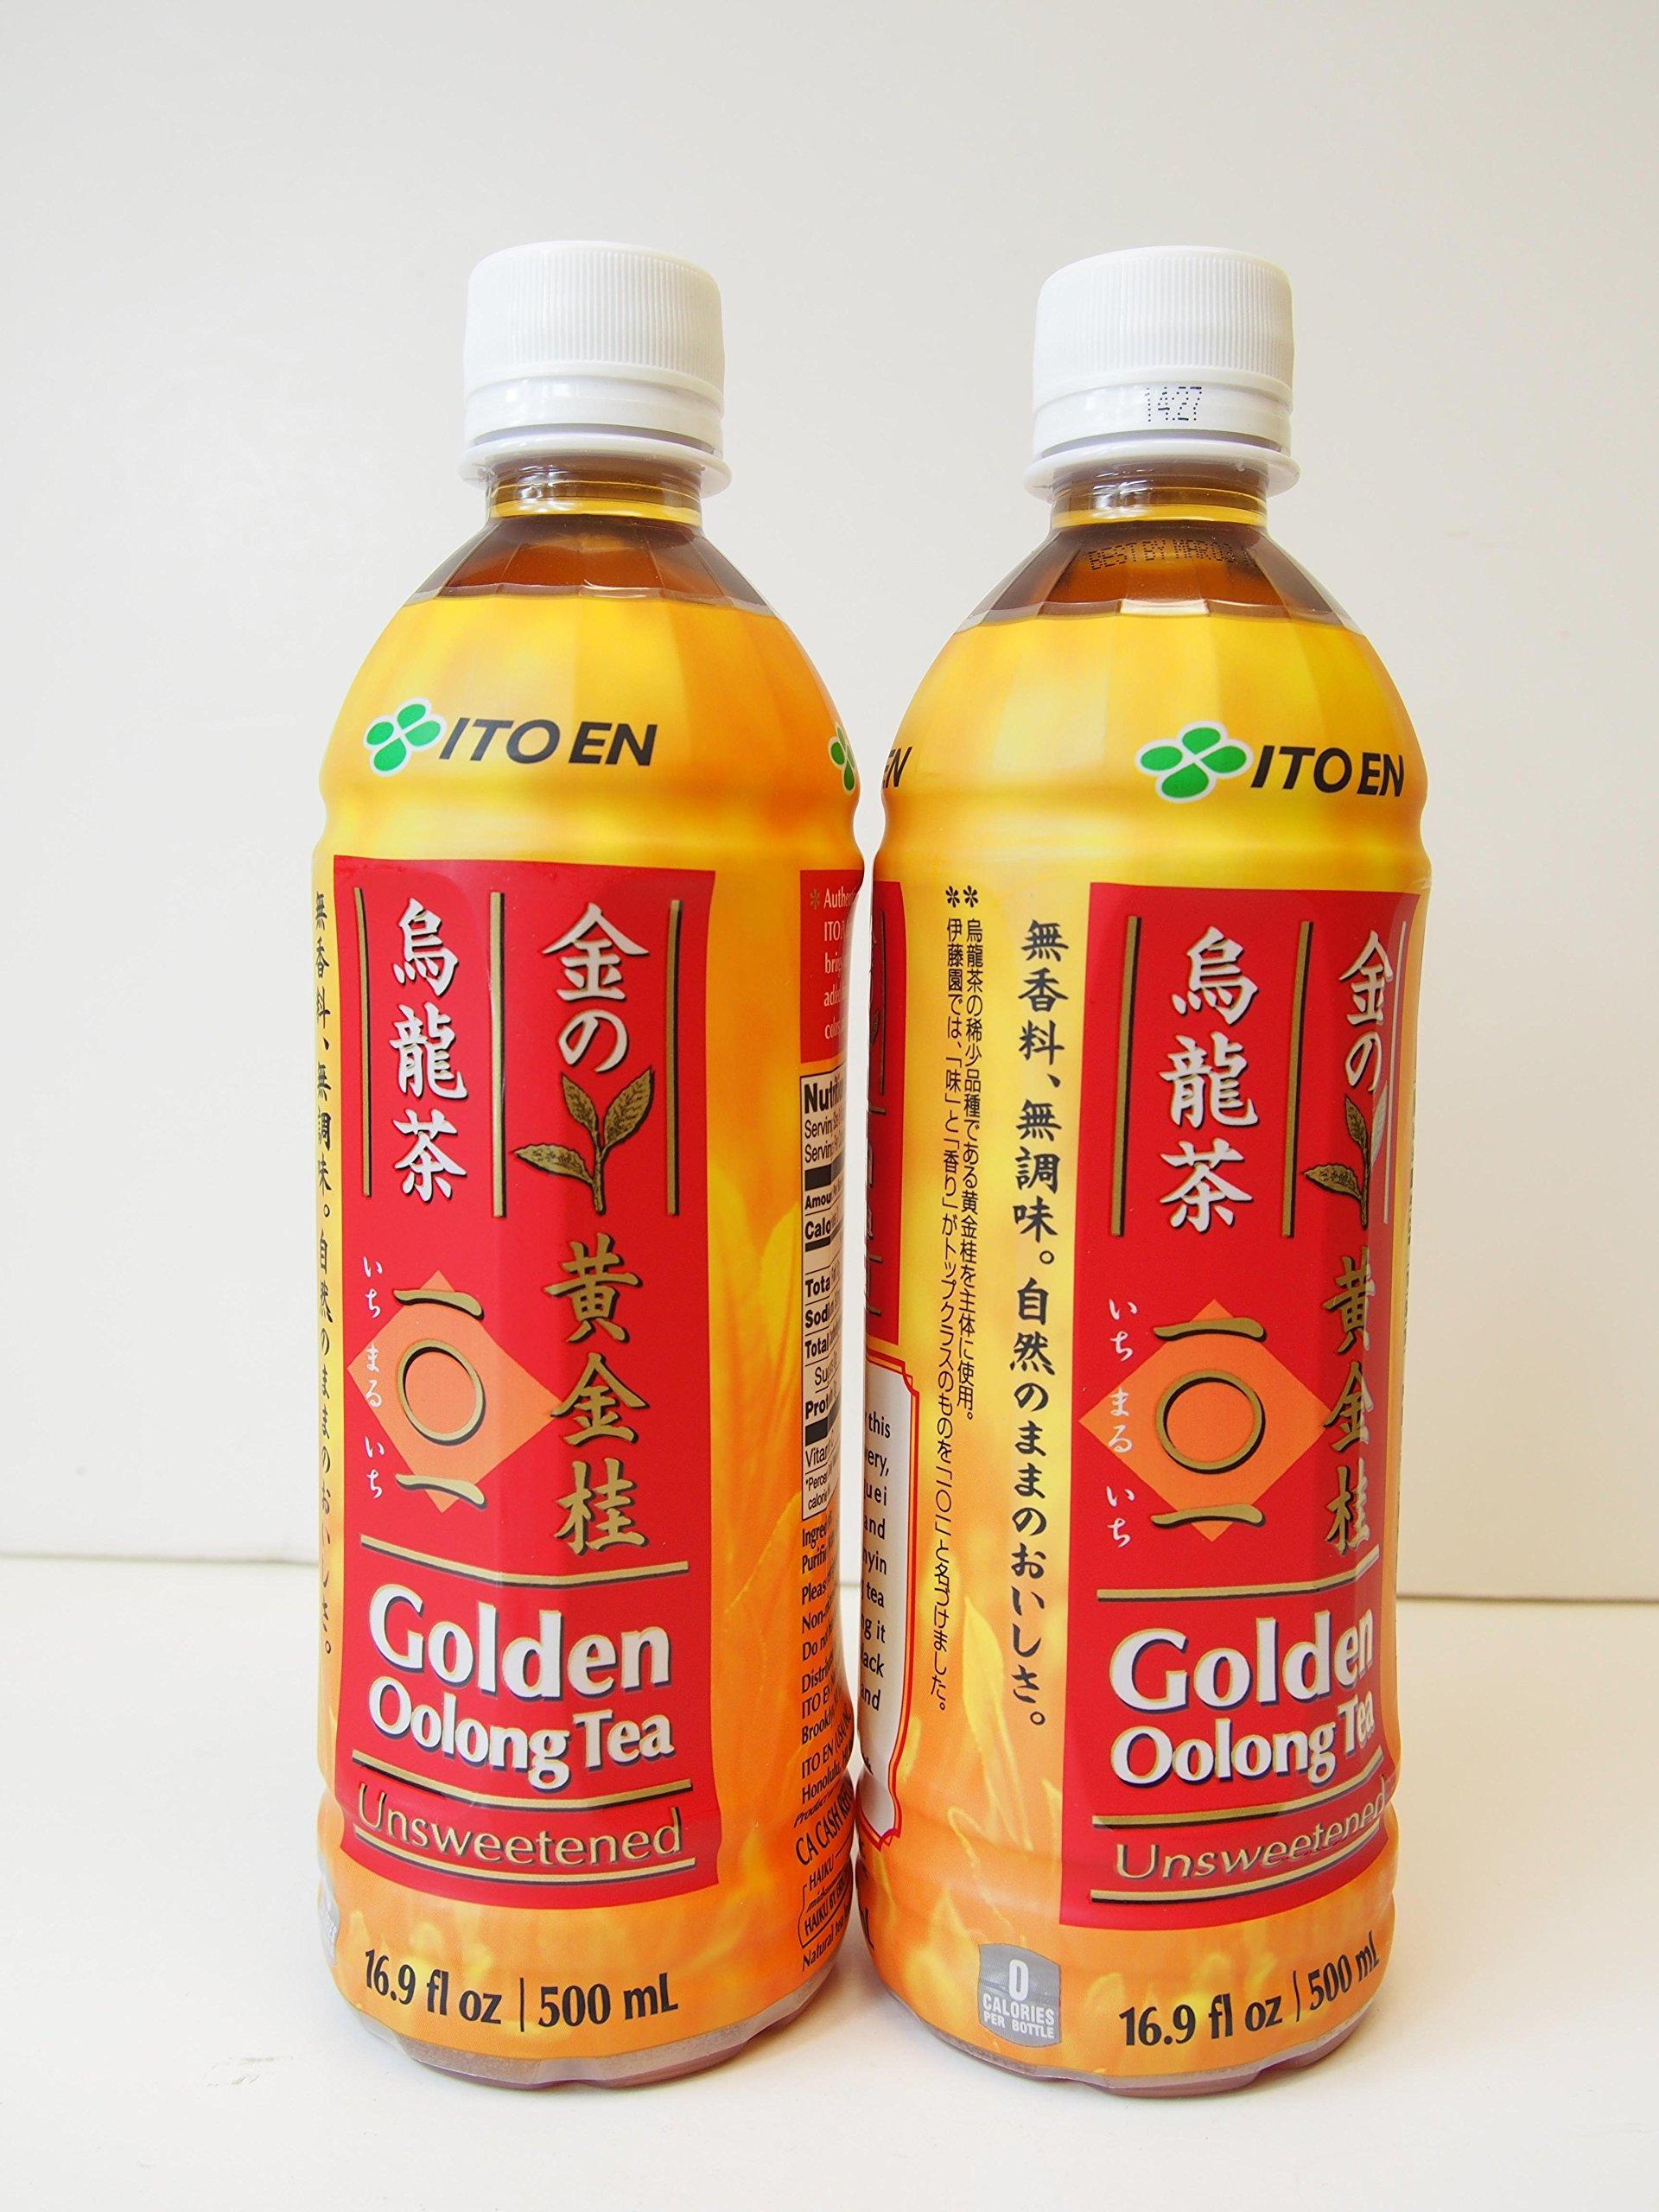 Ito En Unsweetened Golden Oolong Tea 500ml (2-Pack)